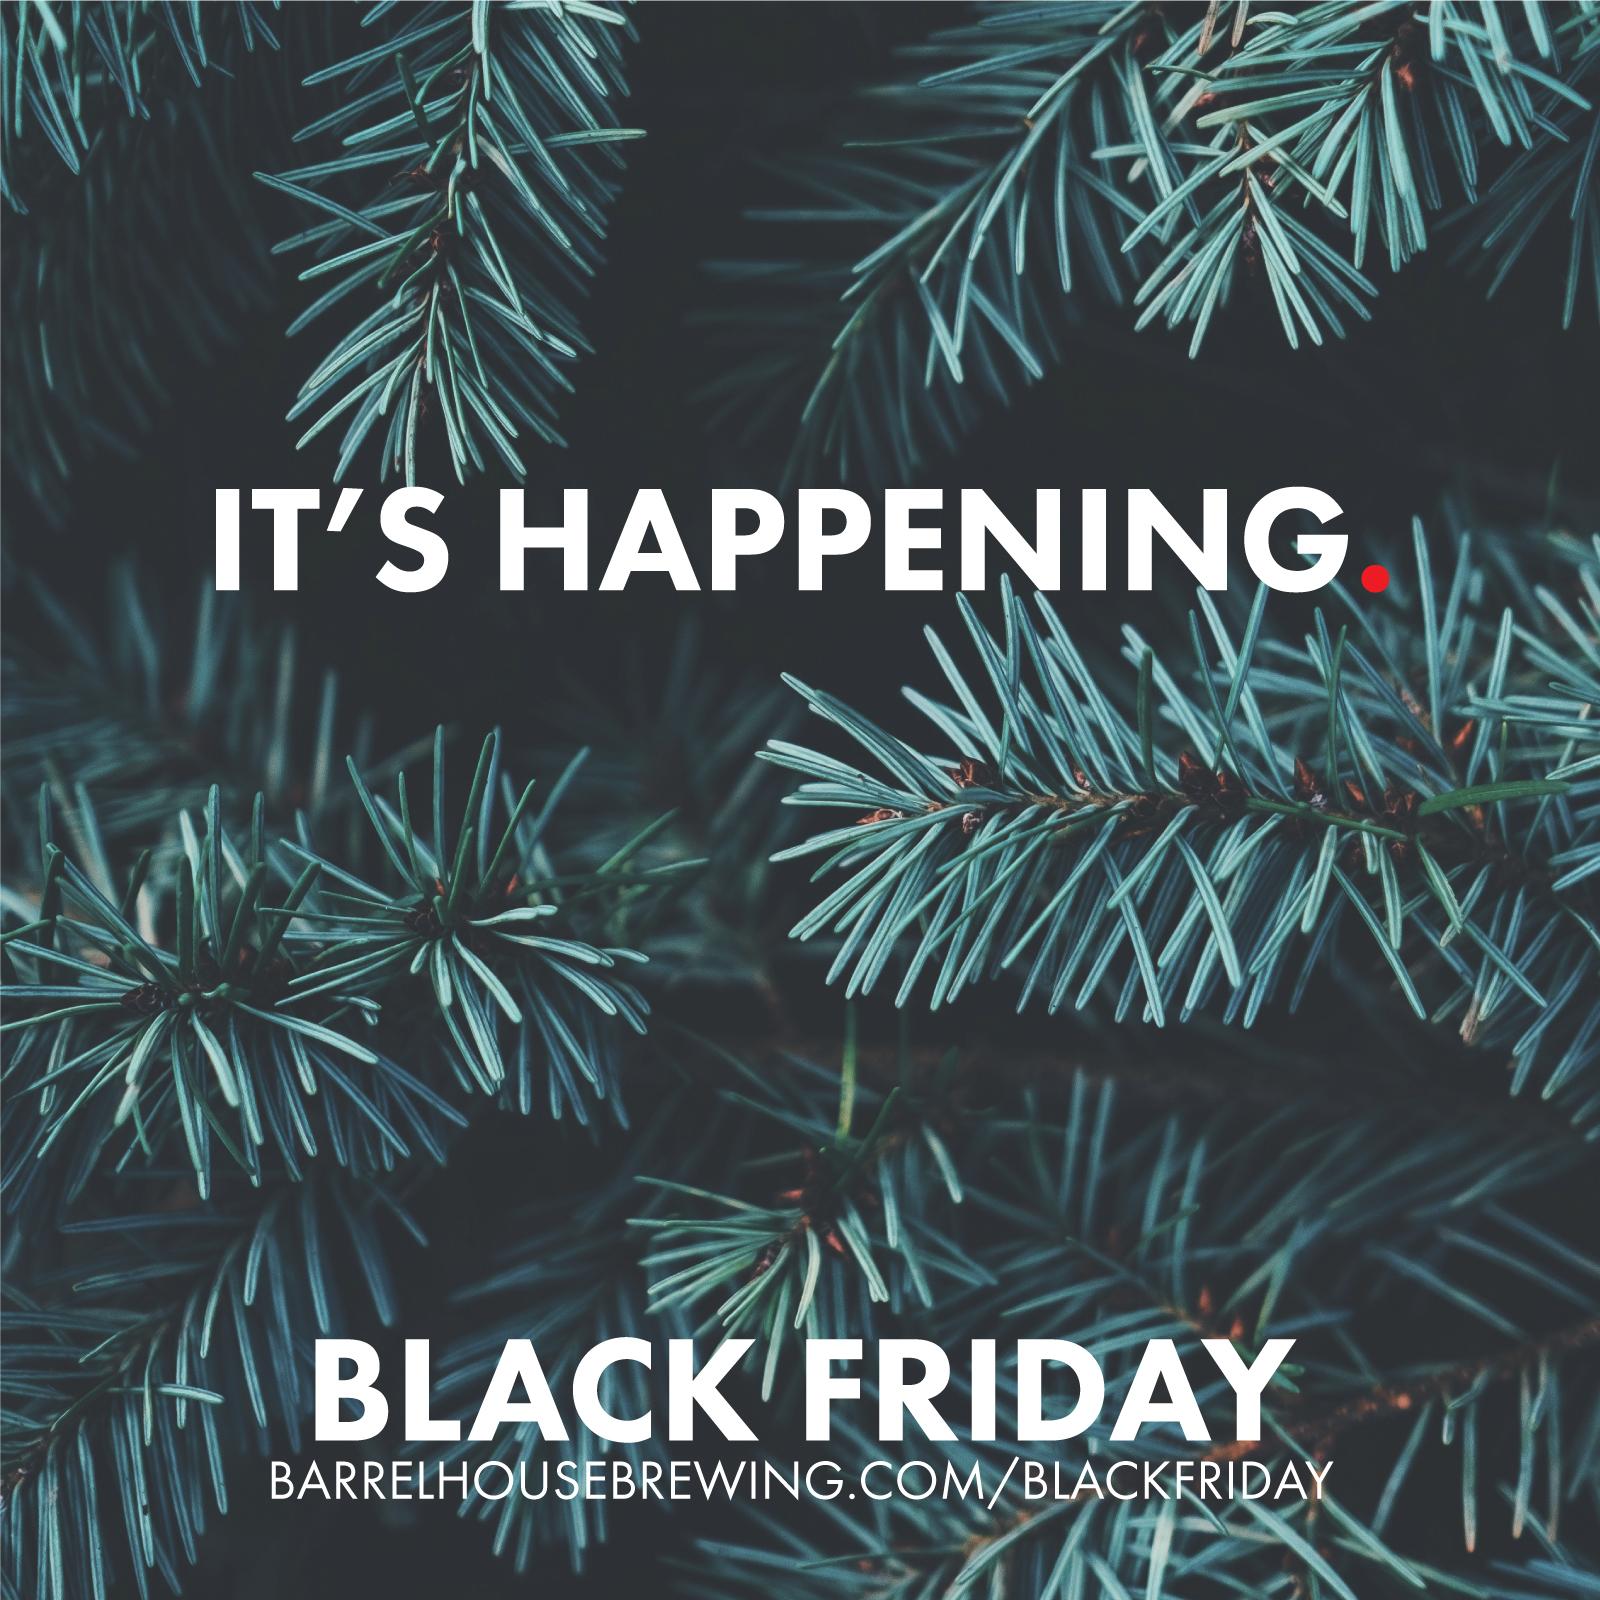 20181123-Black-Friday-Marketing-IG.jpg